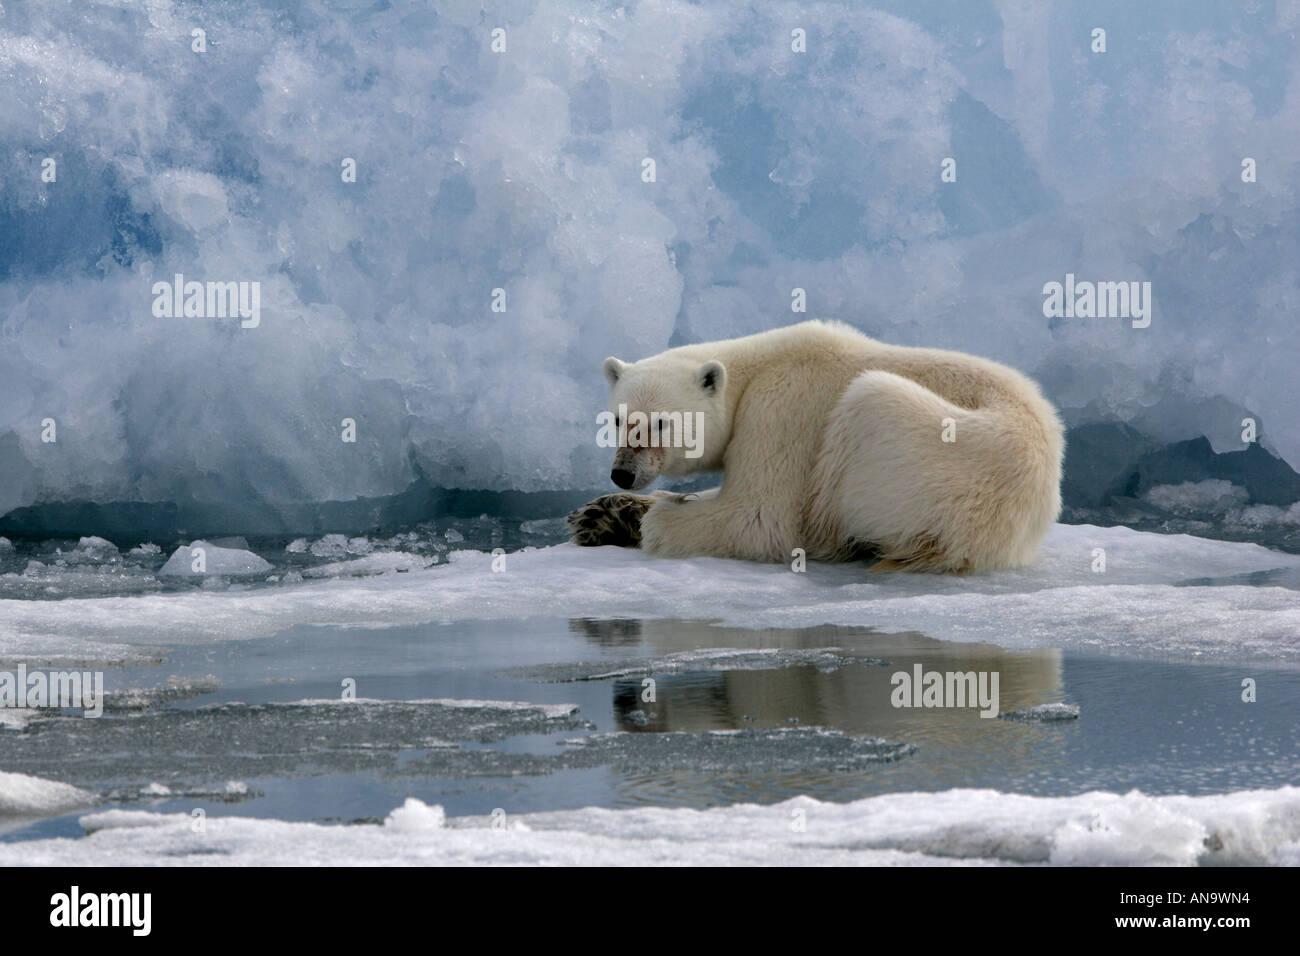 Polar Bear - Stock Image